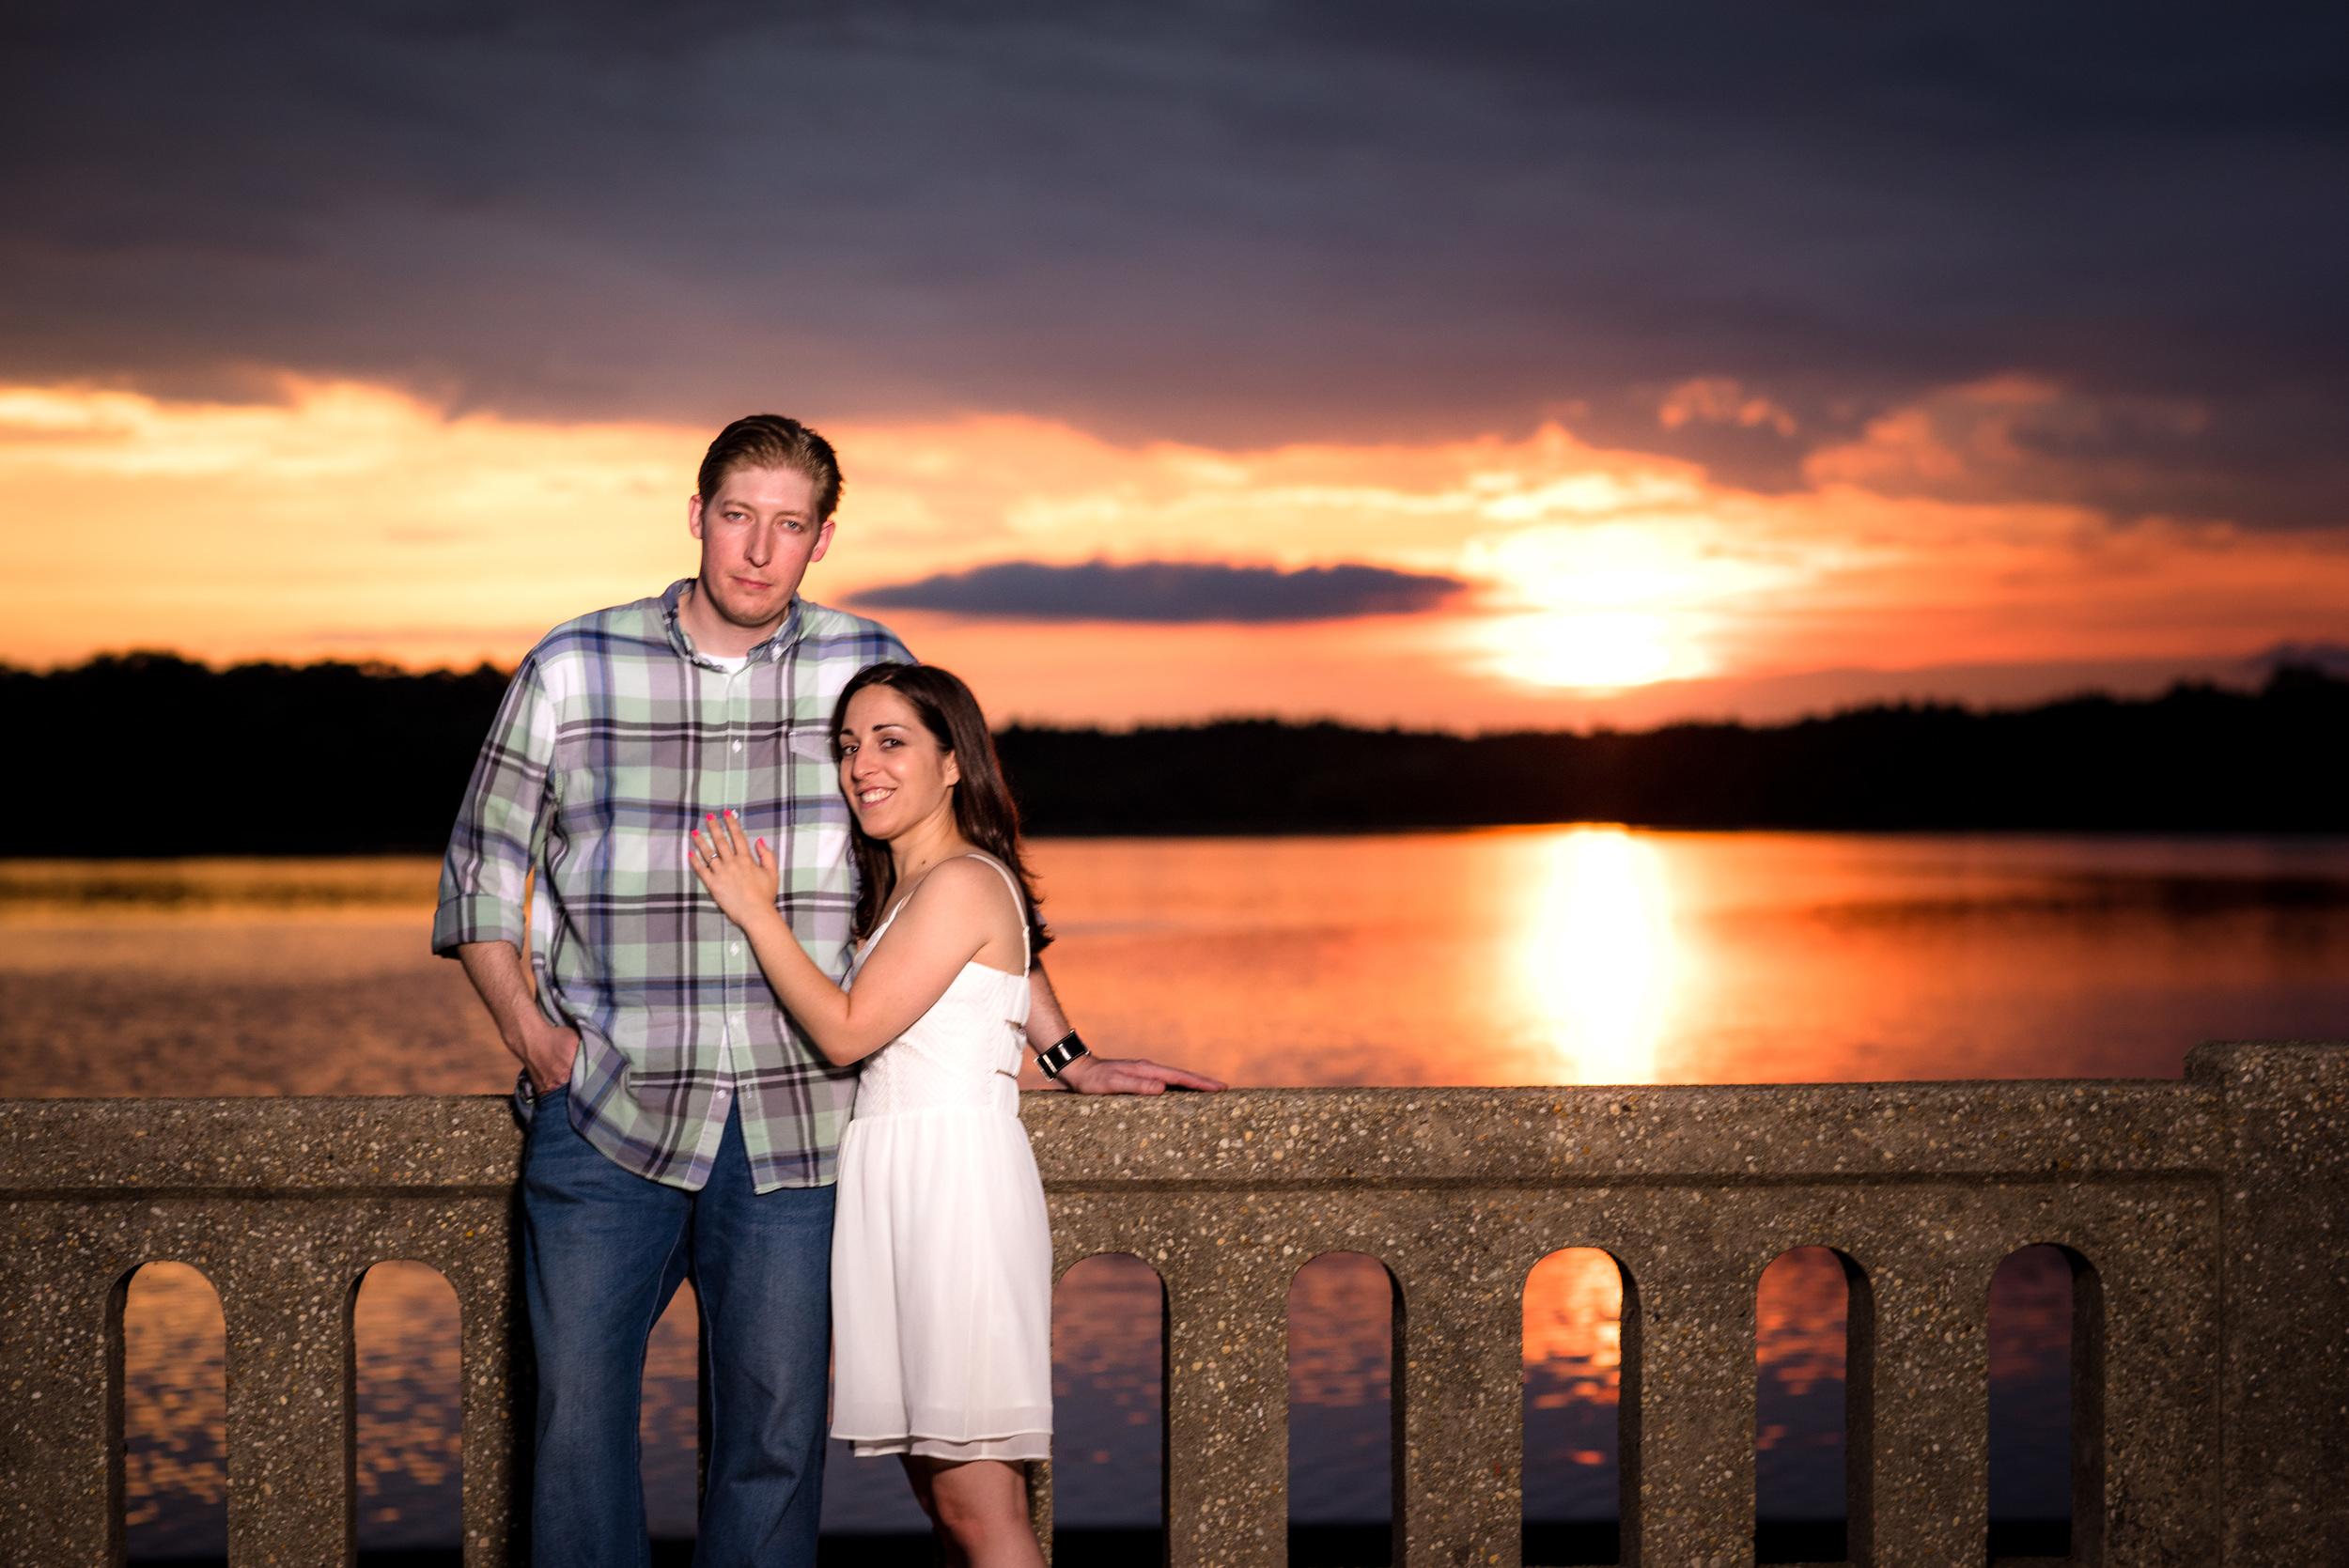 Parvins State Park Engagement Session Brian & Melissa 9